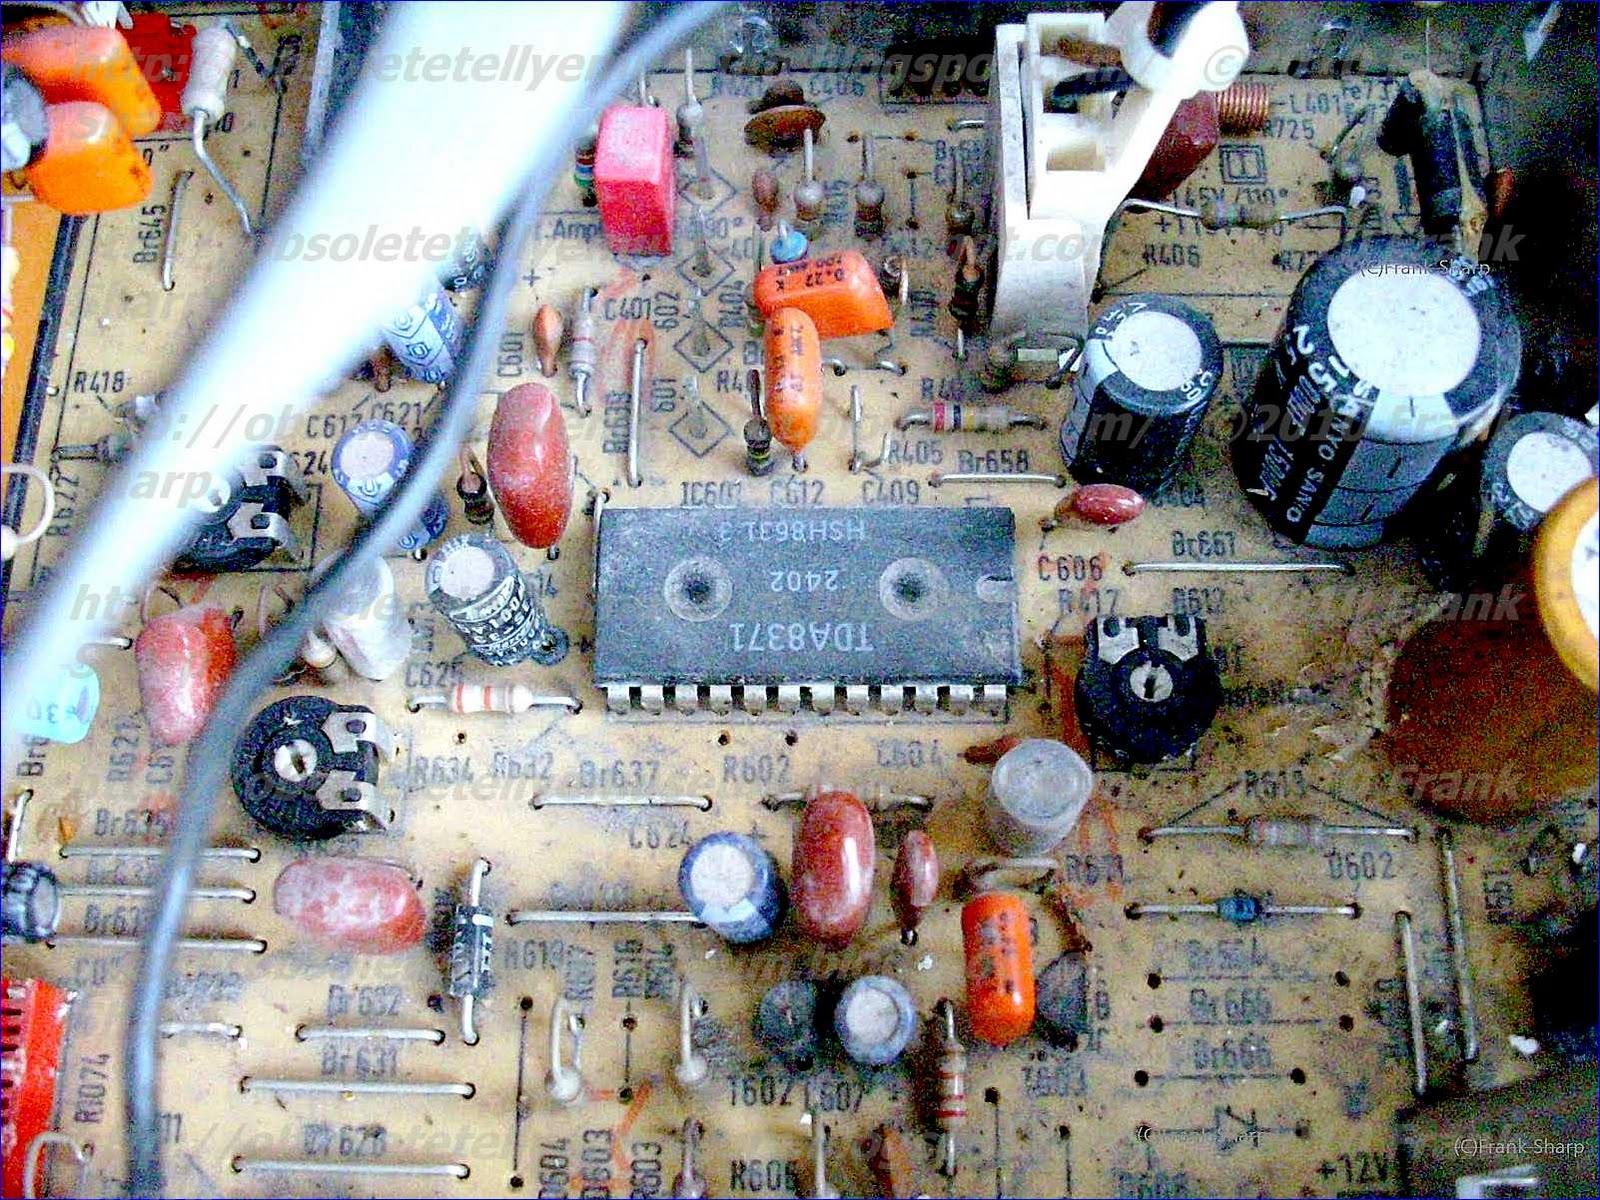 Obsolete Technology Tellye !: SCHAUB LORENZ (ITT) 8838 I CHASSIS ...